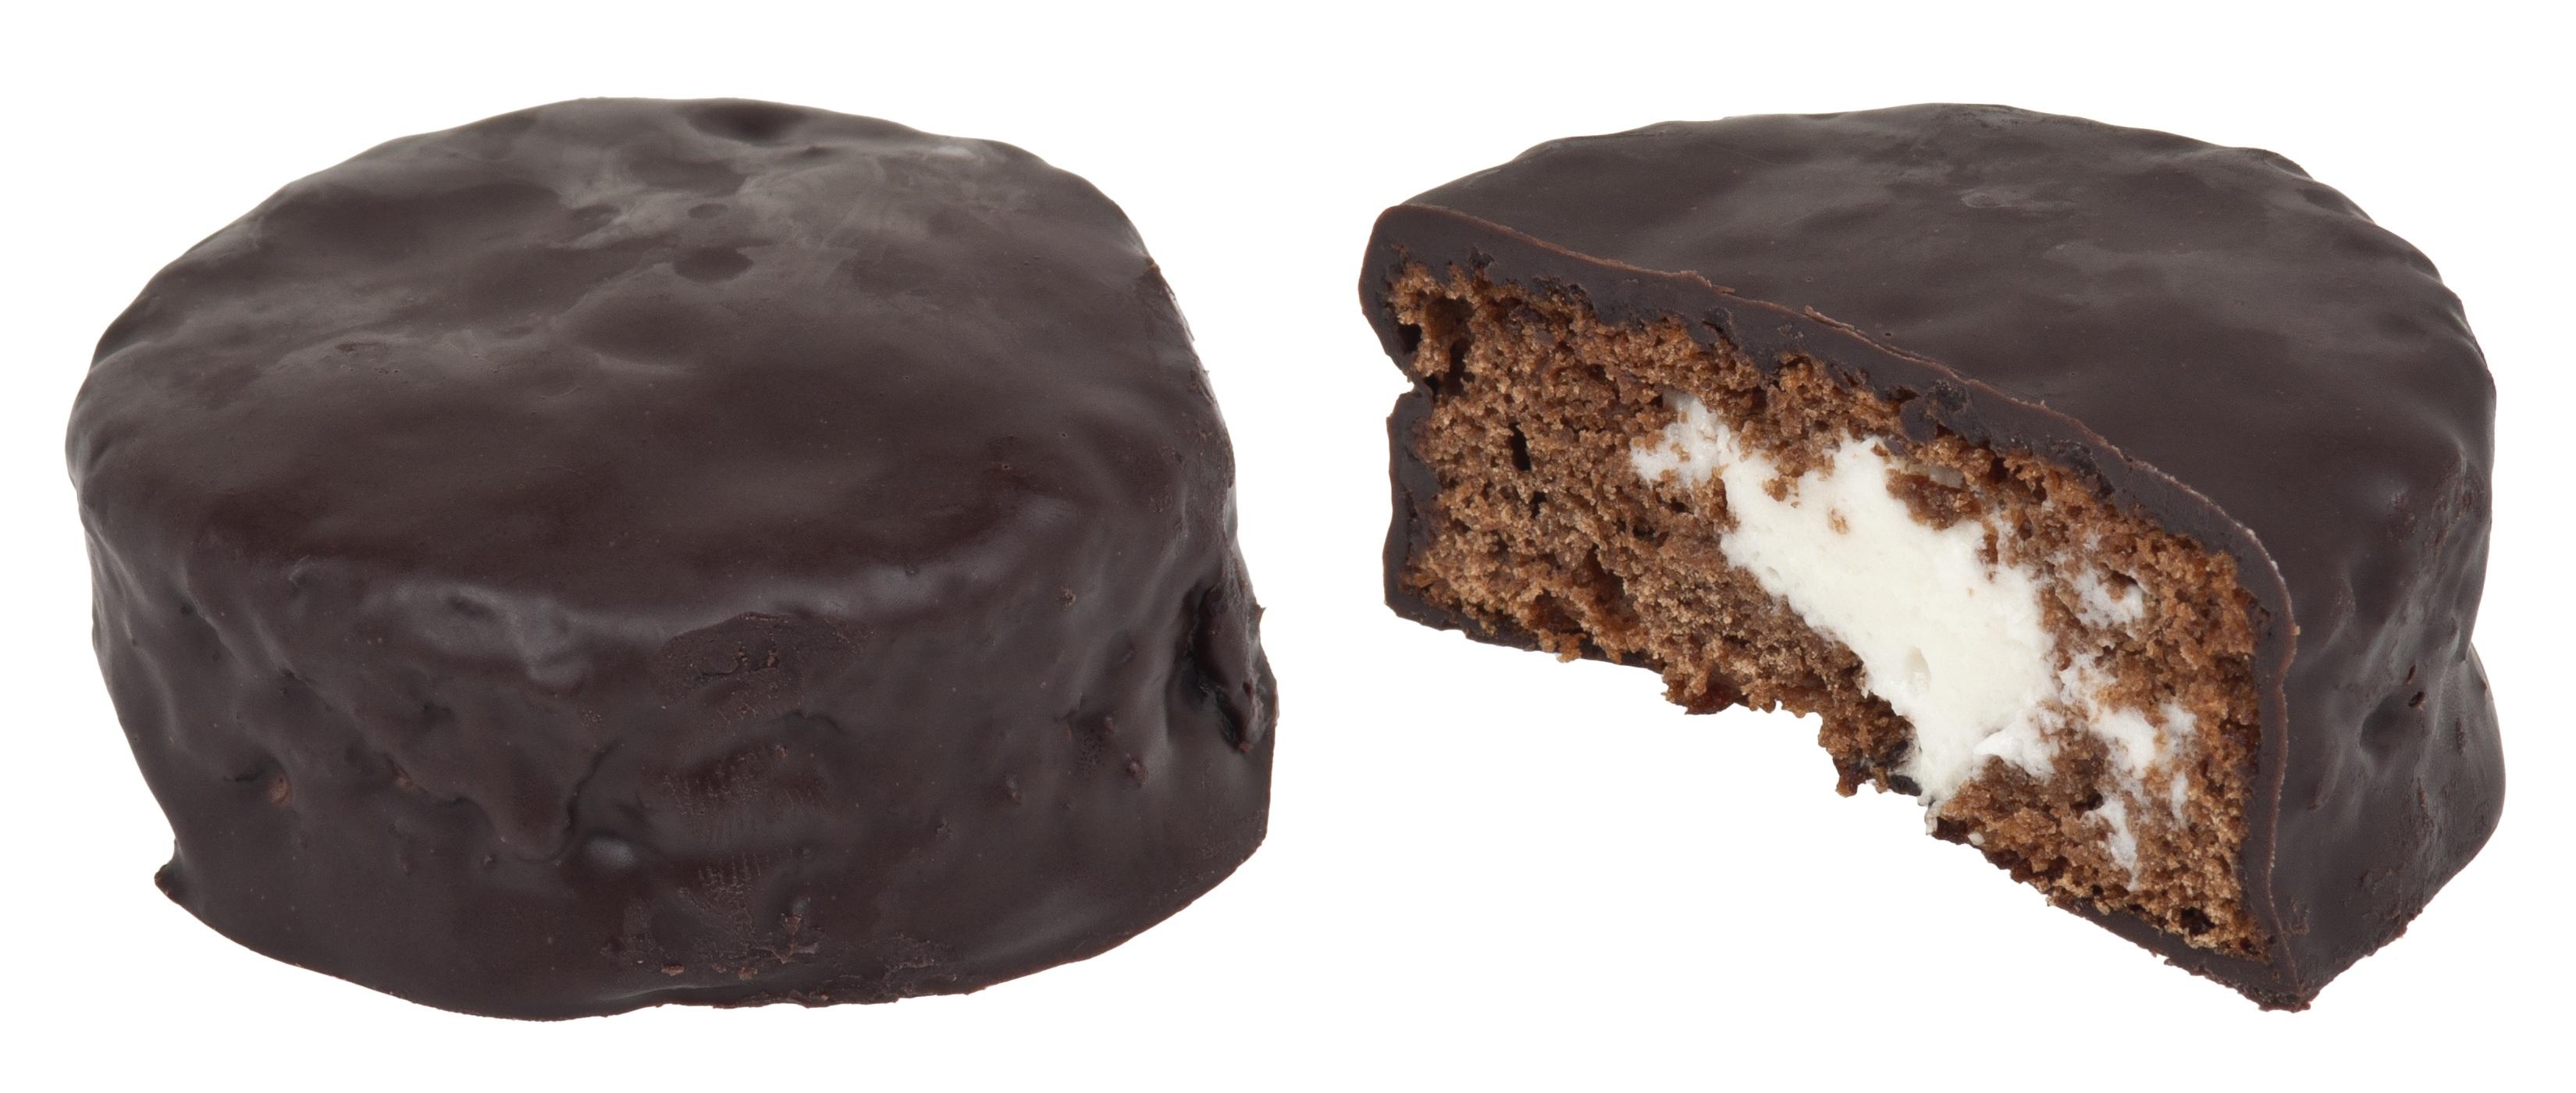 Free fotobanka : sladký, prsten, jídlo, čokoláda, dezert ...